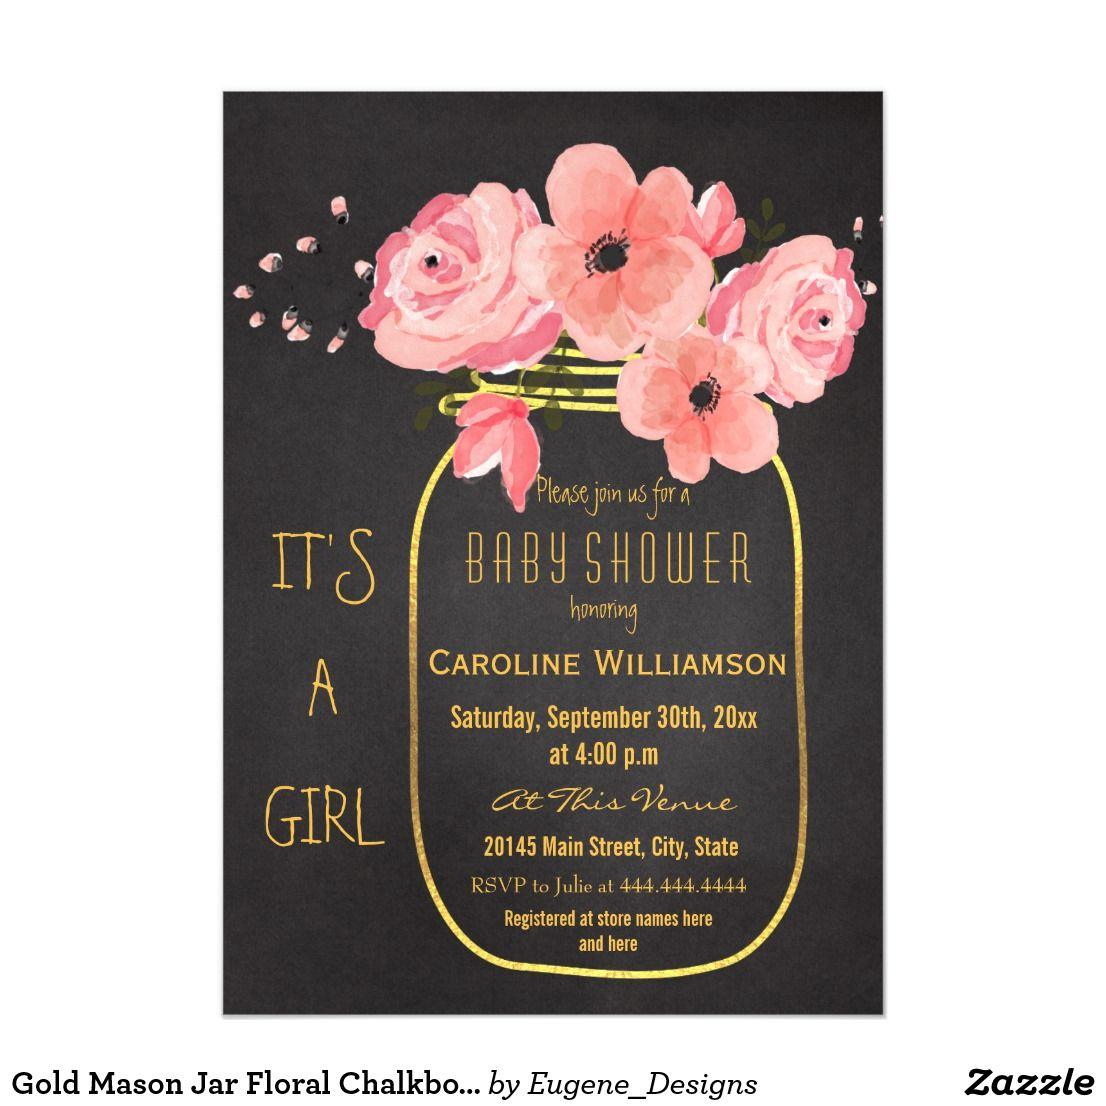 Gold mason jar floral chalkboard baby shower magnetic invitation gold mason jar floral chalkboard baby shower magnetic card pink personalized watercolor flowers and gold mason filmwisefo